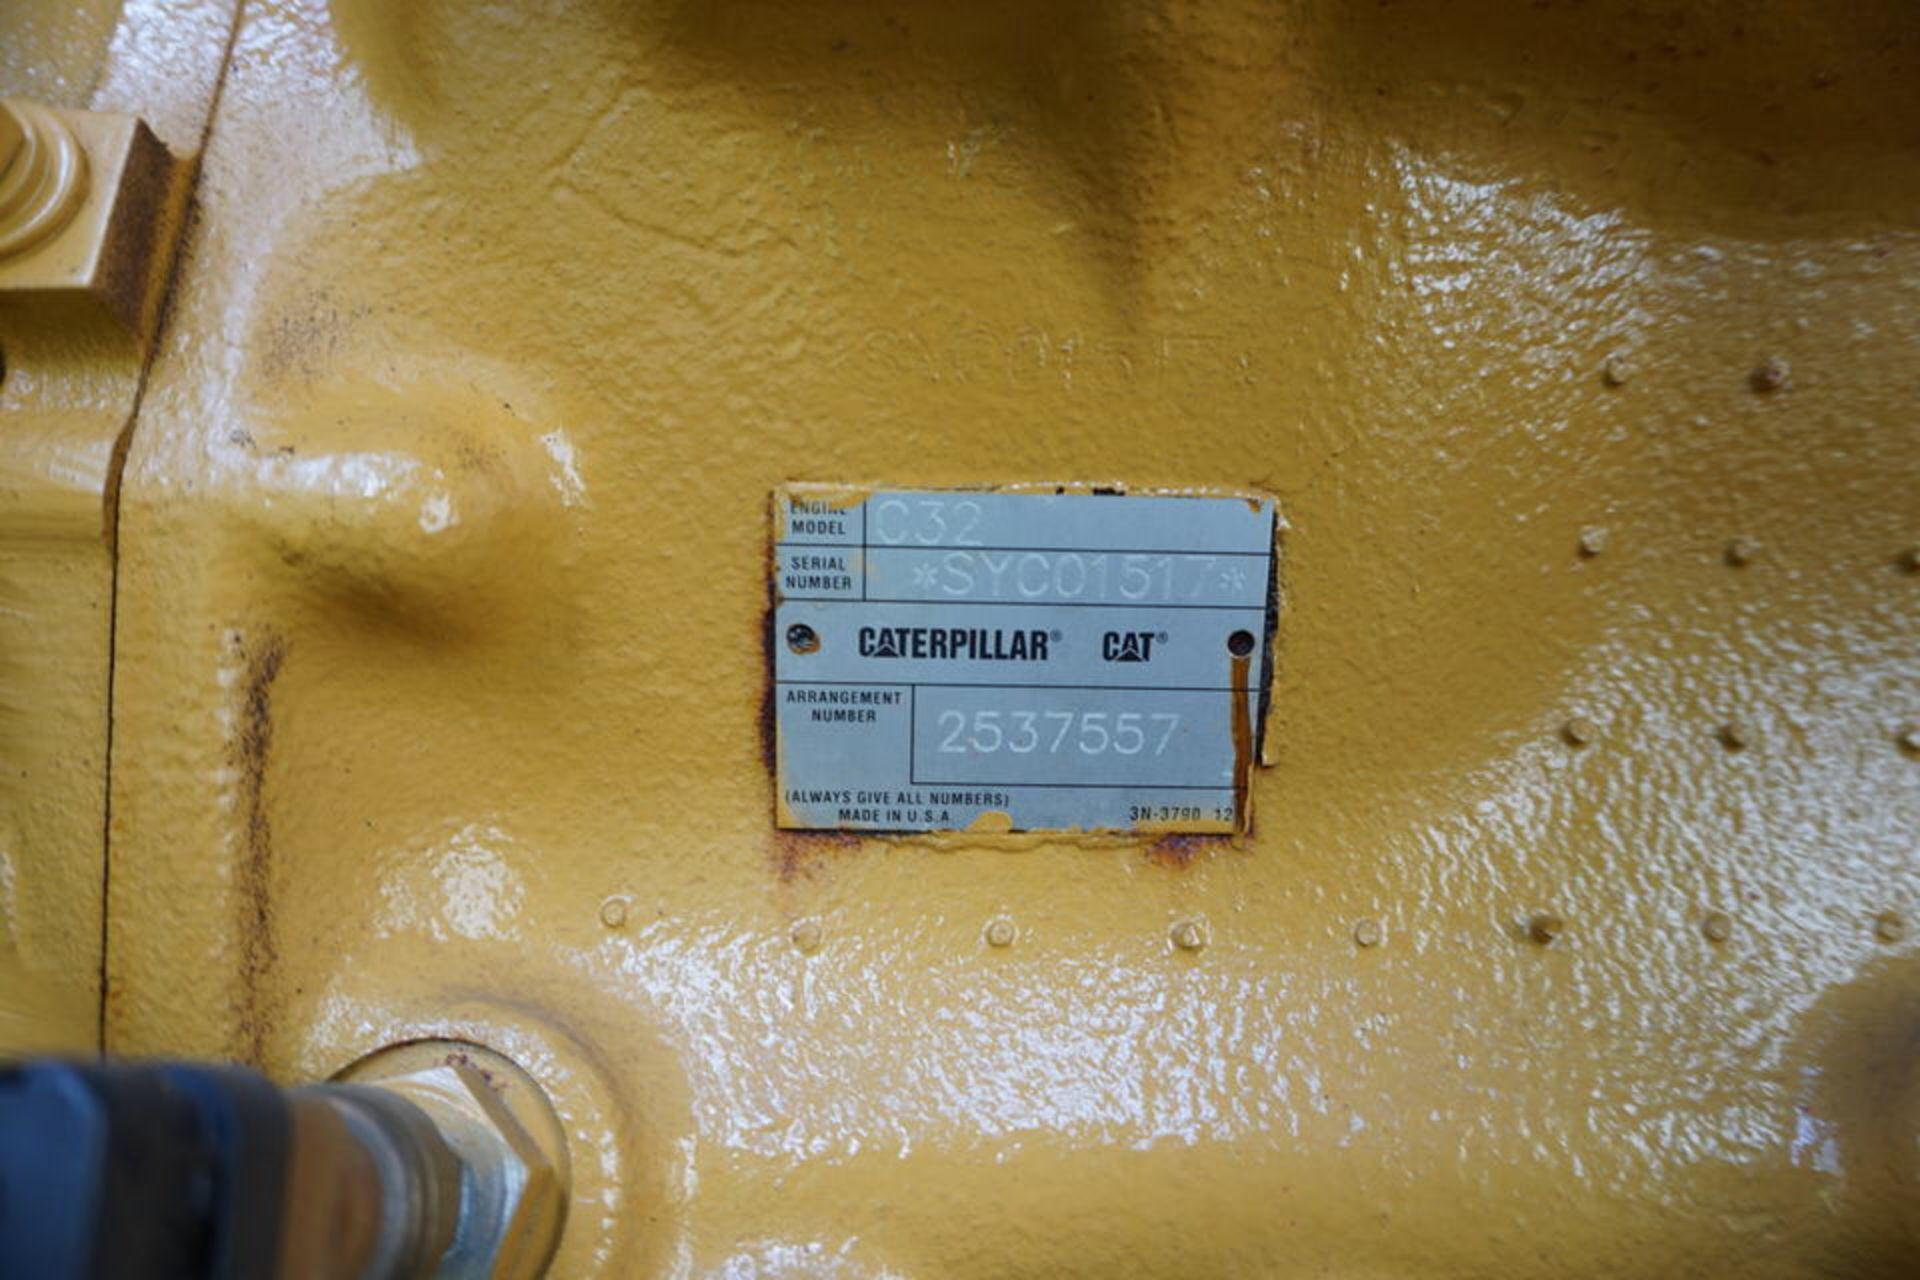 2007 CATERPILLAR BACK UP GENERATOR, ENGINE MODEL: C32 W/ EMCP3.3 CONTROL, 173.9 HOURS, 1250 KVA - Image 9 of 25